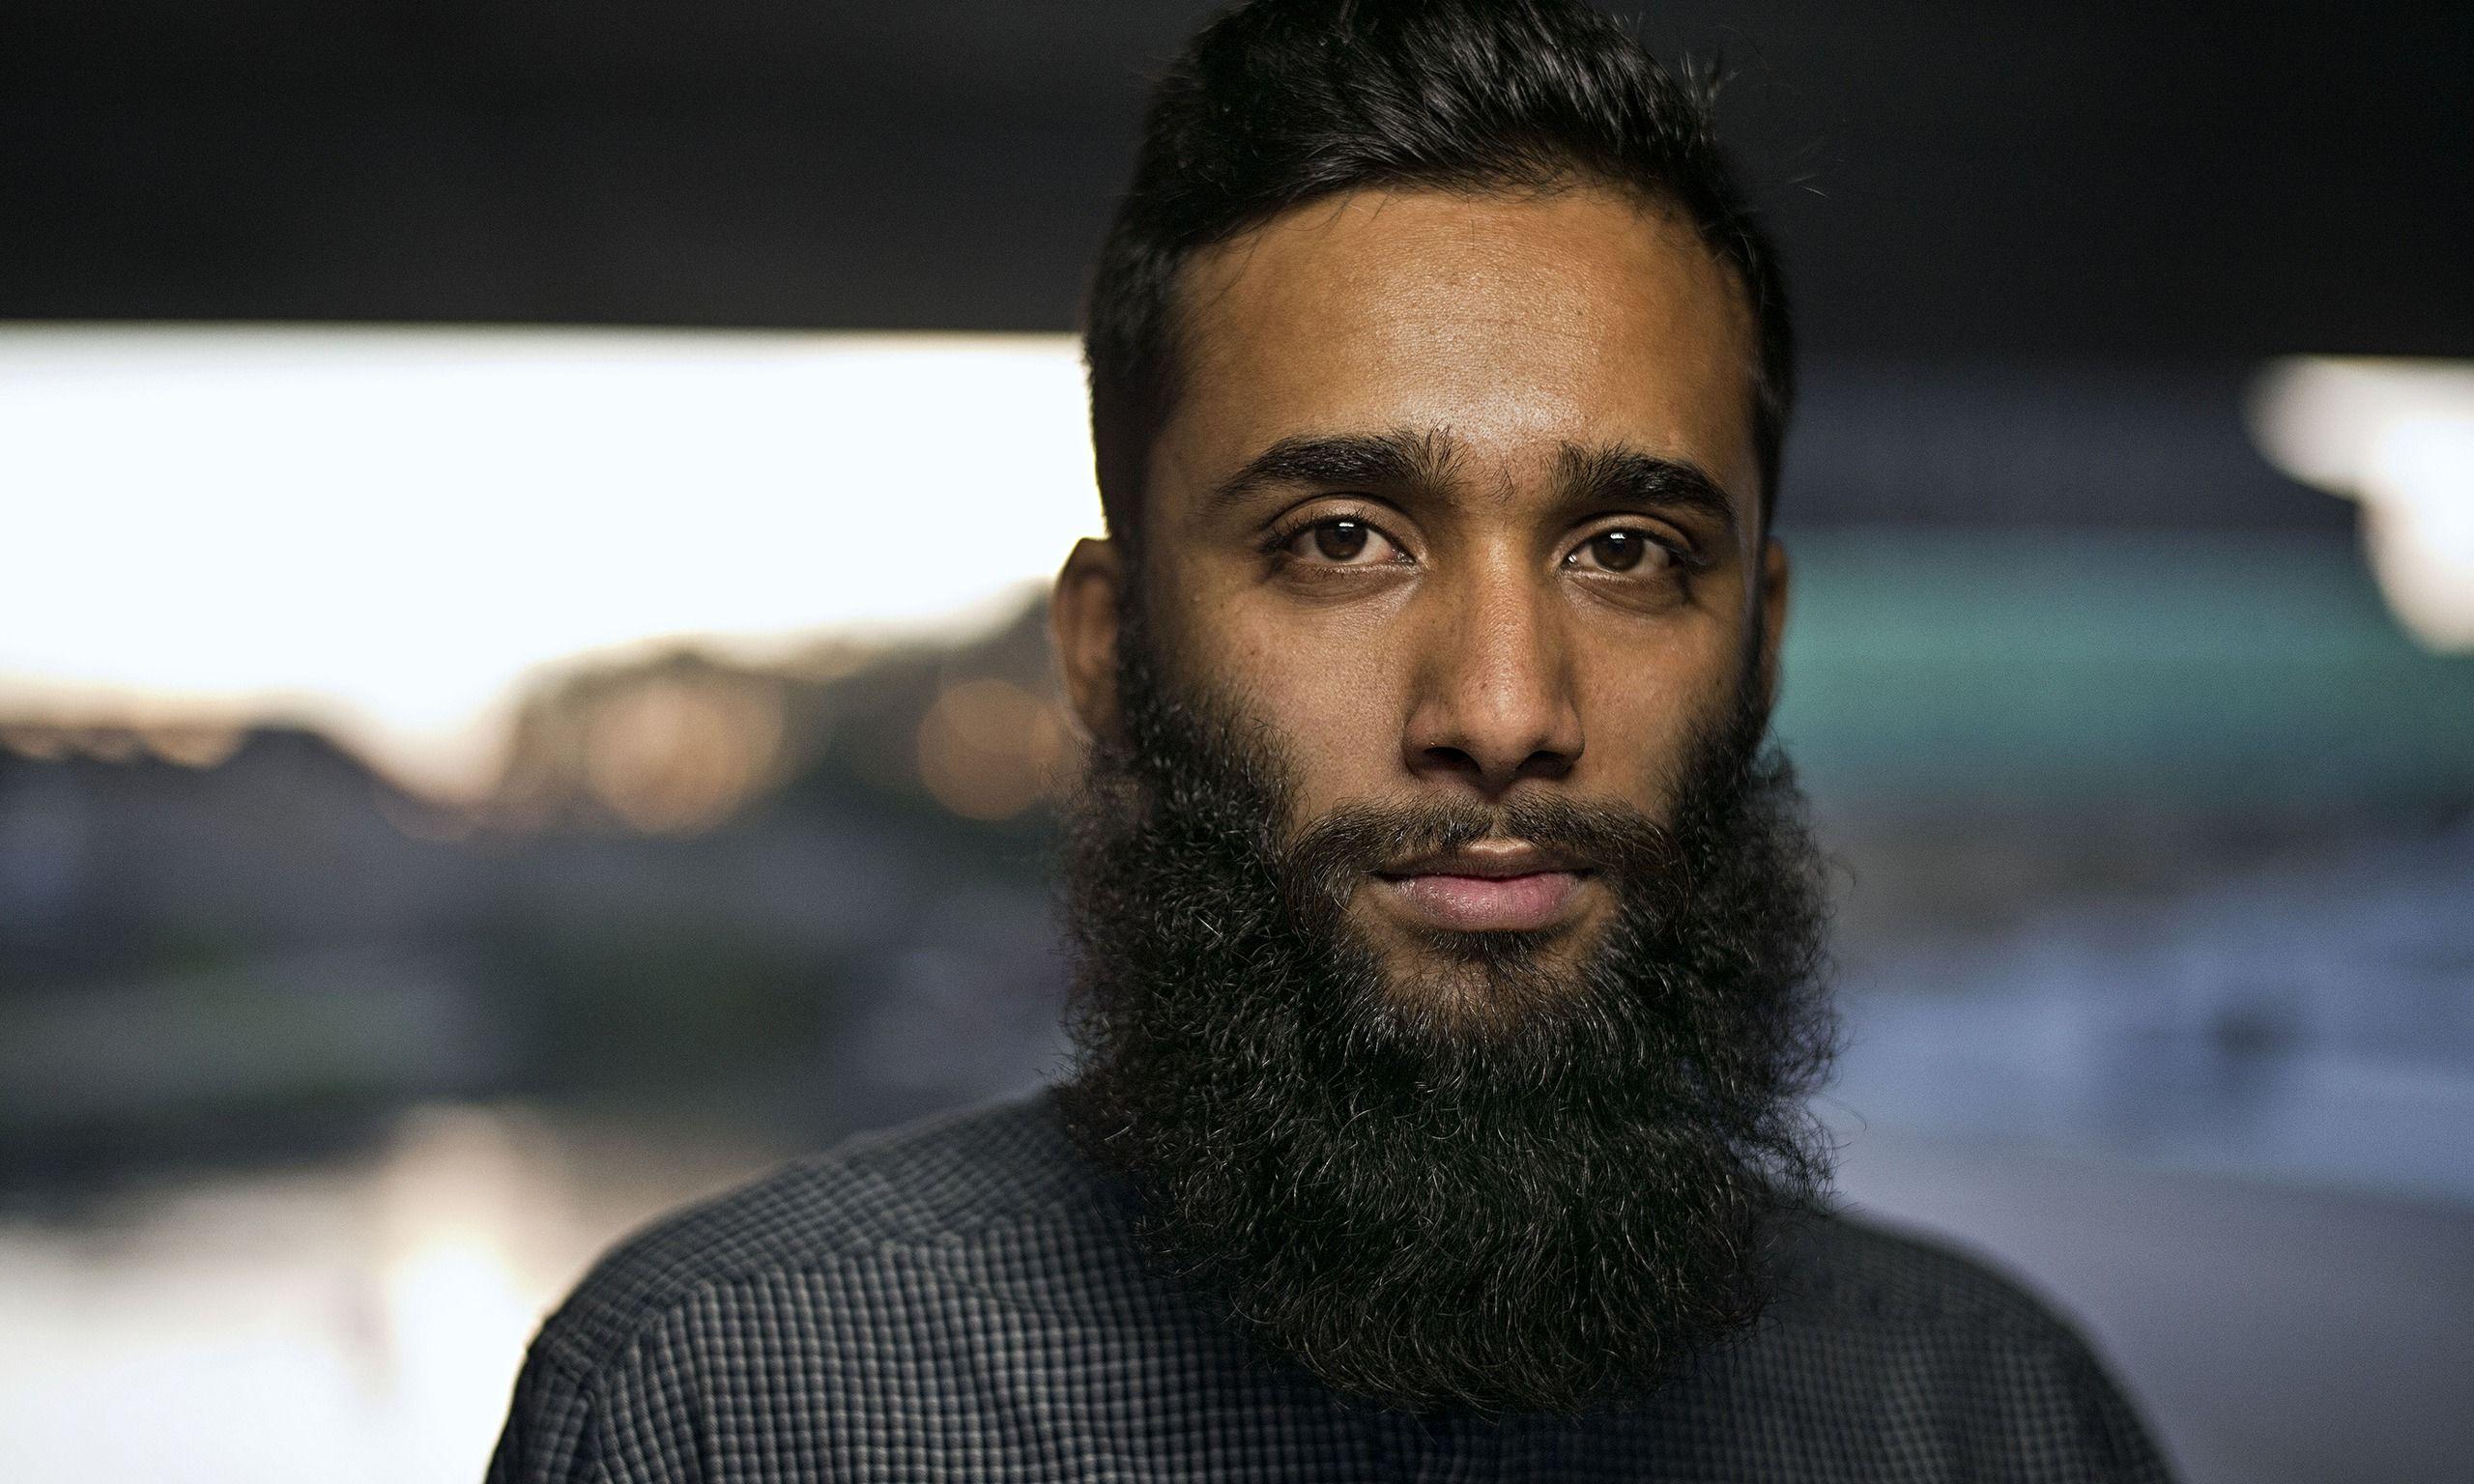 03d0250e986 I m a Muslim with a beard. What s so scary about that